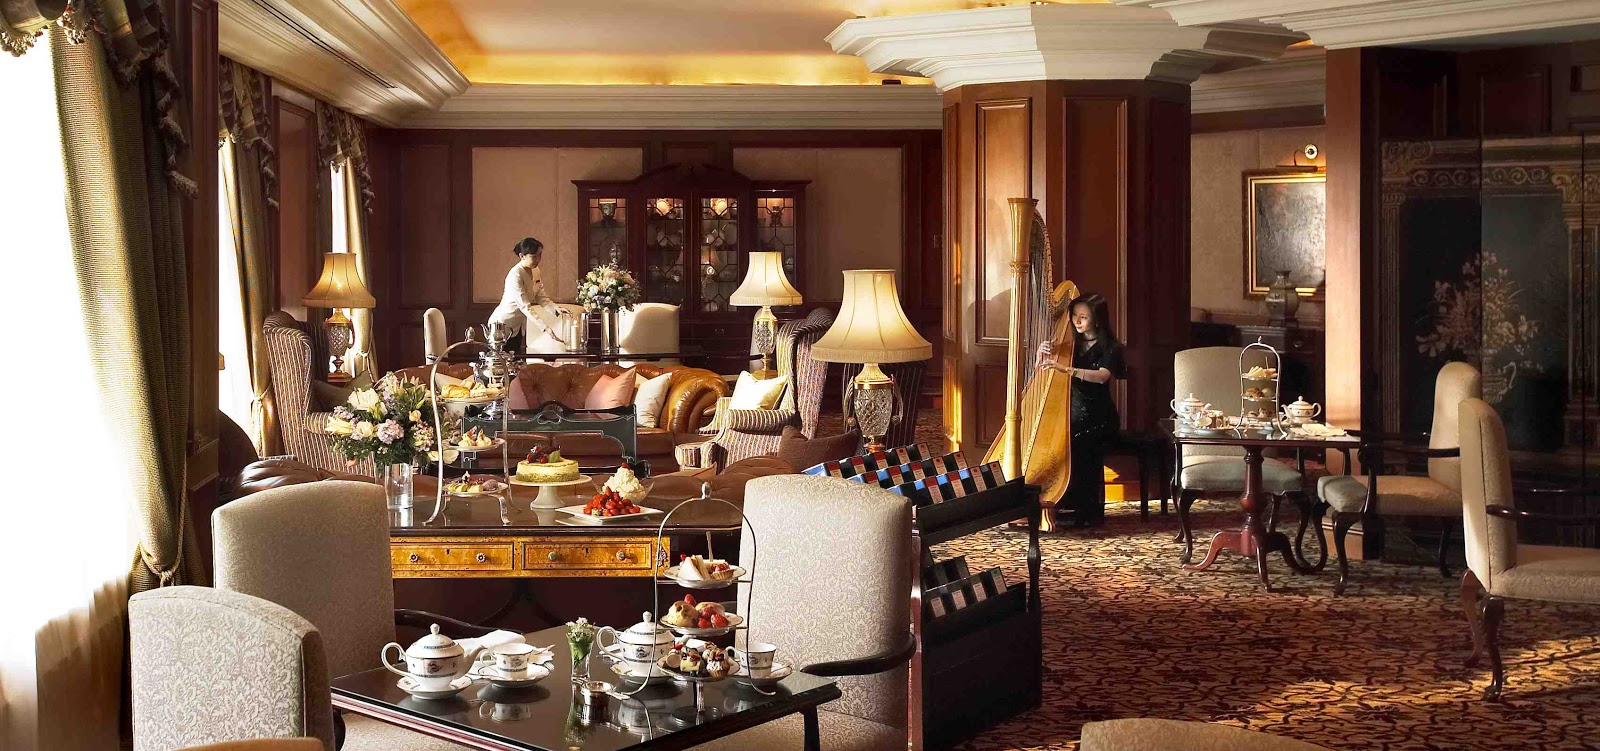 Luxury Hotel in Philadelphia  The RitzCarlton Philadelphia